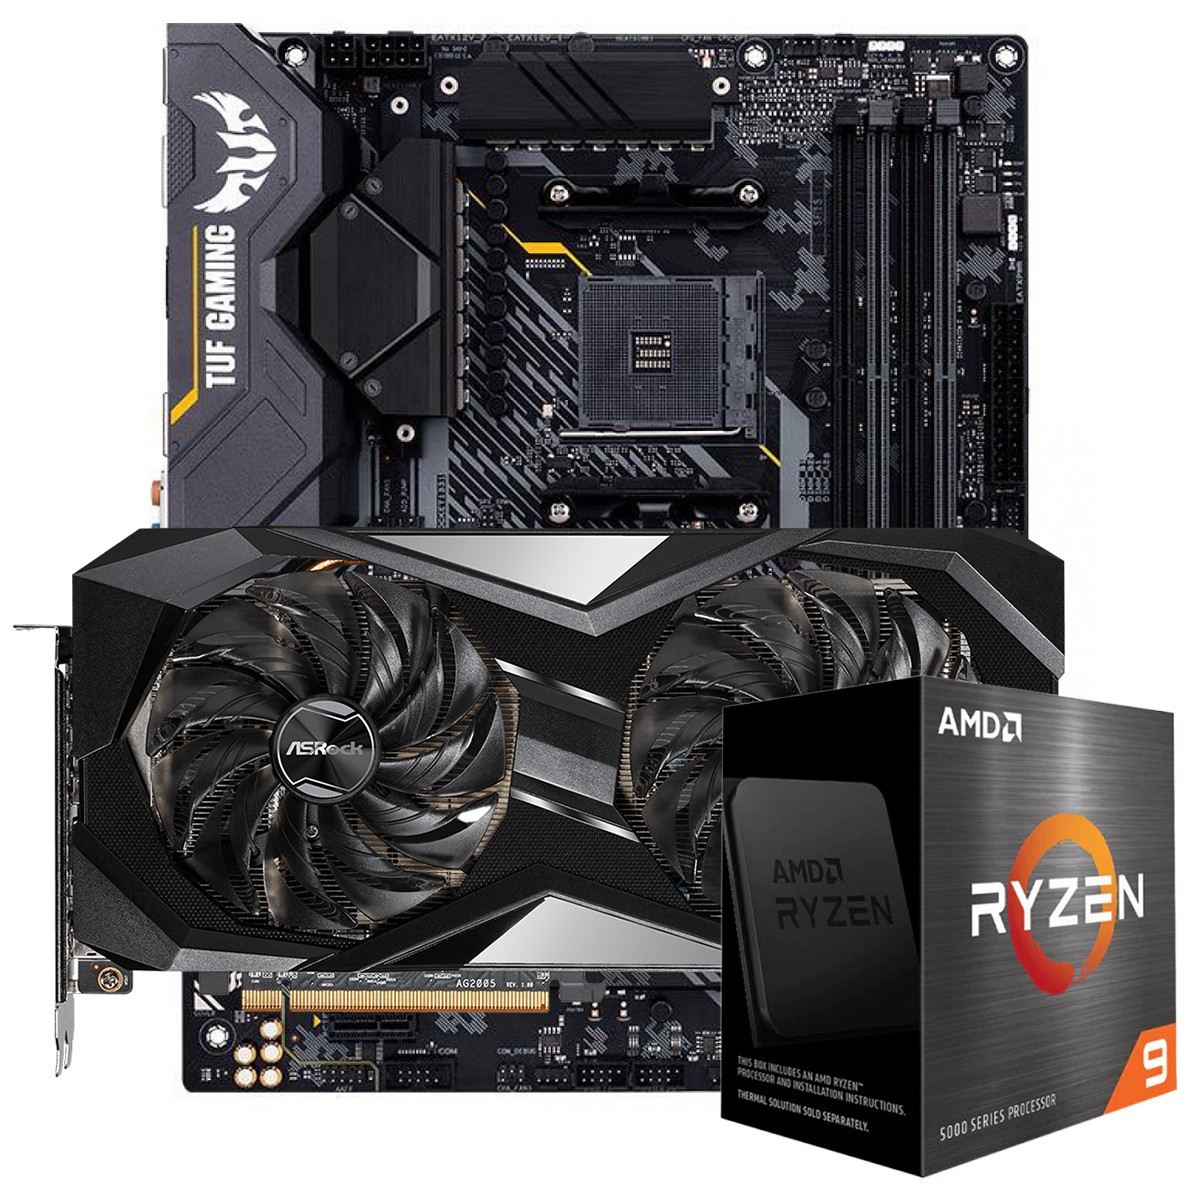 Kit Upgrade ASRock Radeon RX 6700 XT Challenger + AMD Ryzen 9 5900X + ASUS TUF Gaming X570-Plus